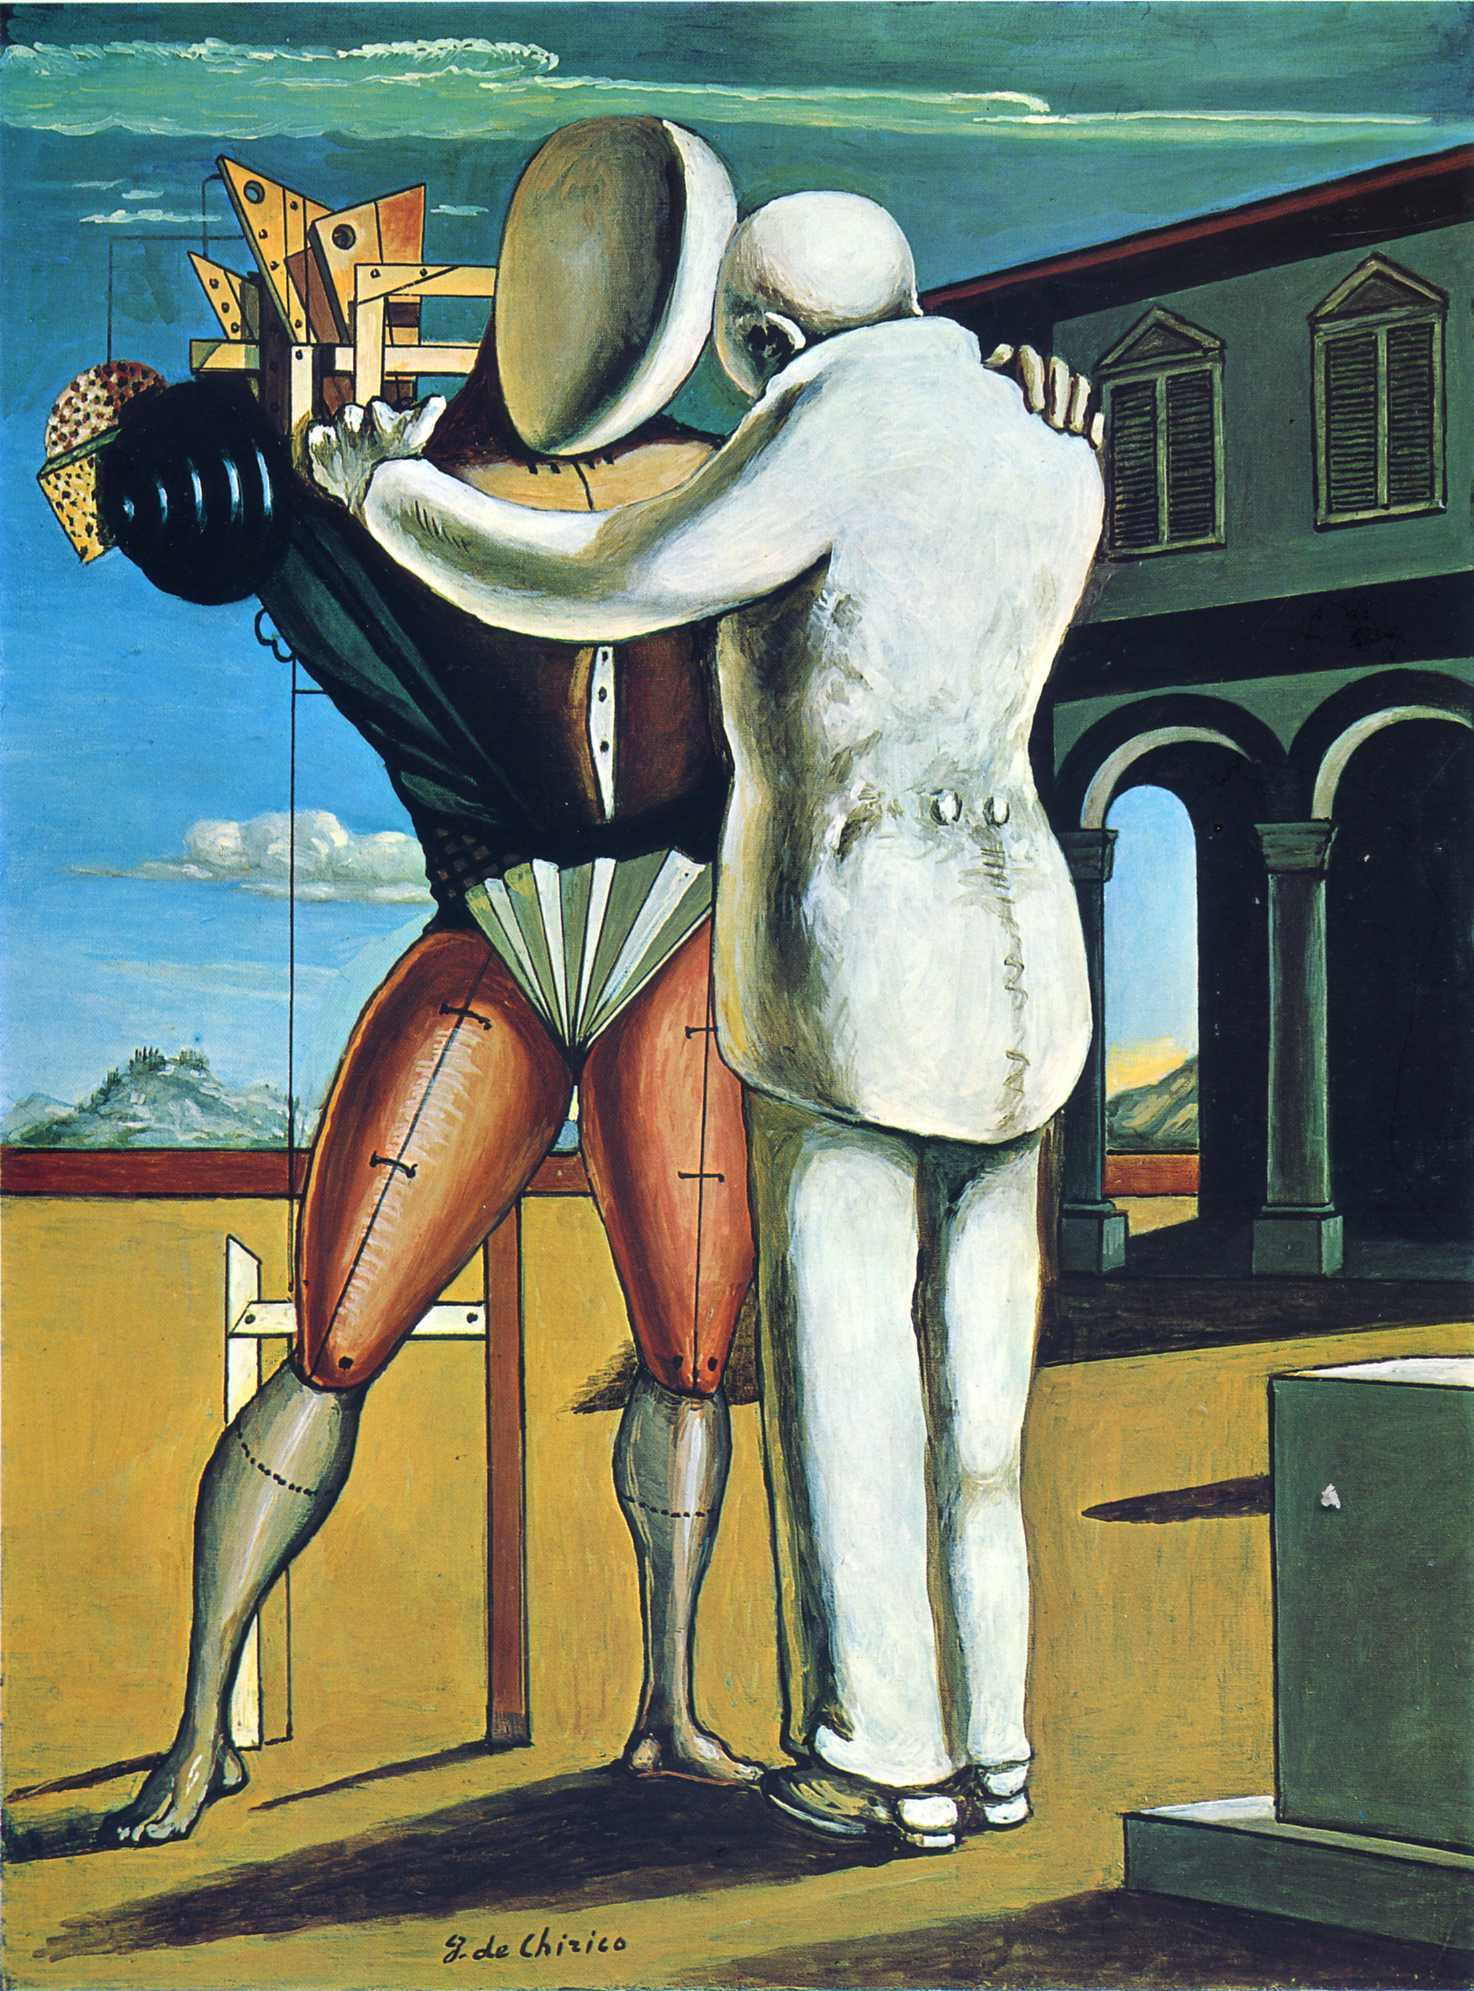 Giorgio de Chirico - Page 2 The-prodigal-son-1965